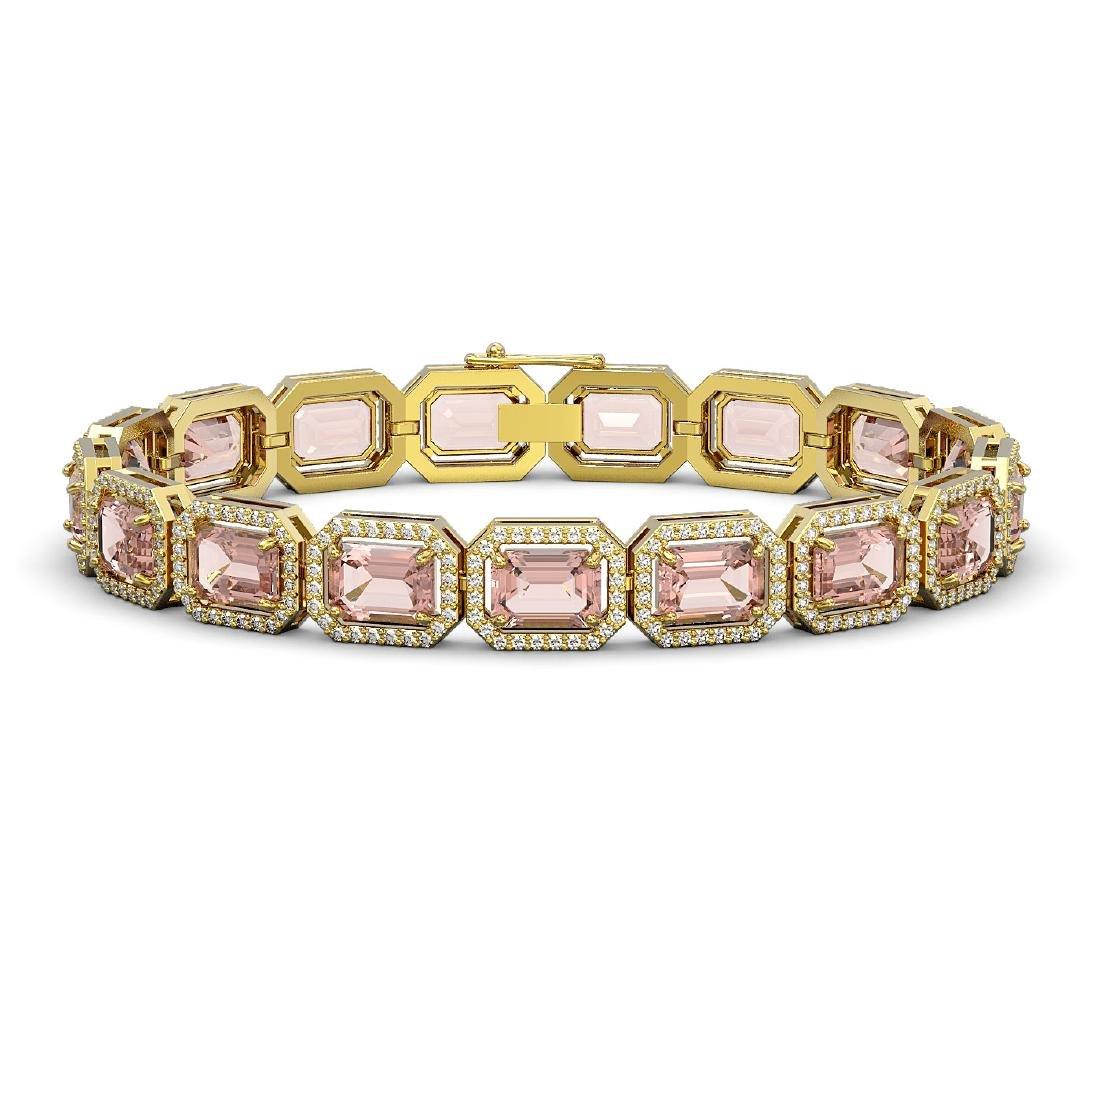 22.81 CTW Morganite & Diamond Halo Bracelet 10K Yellow